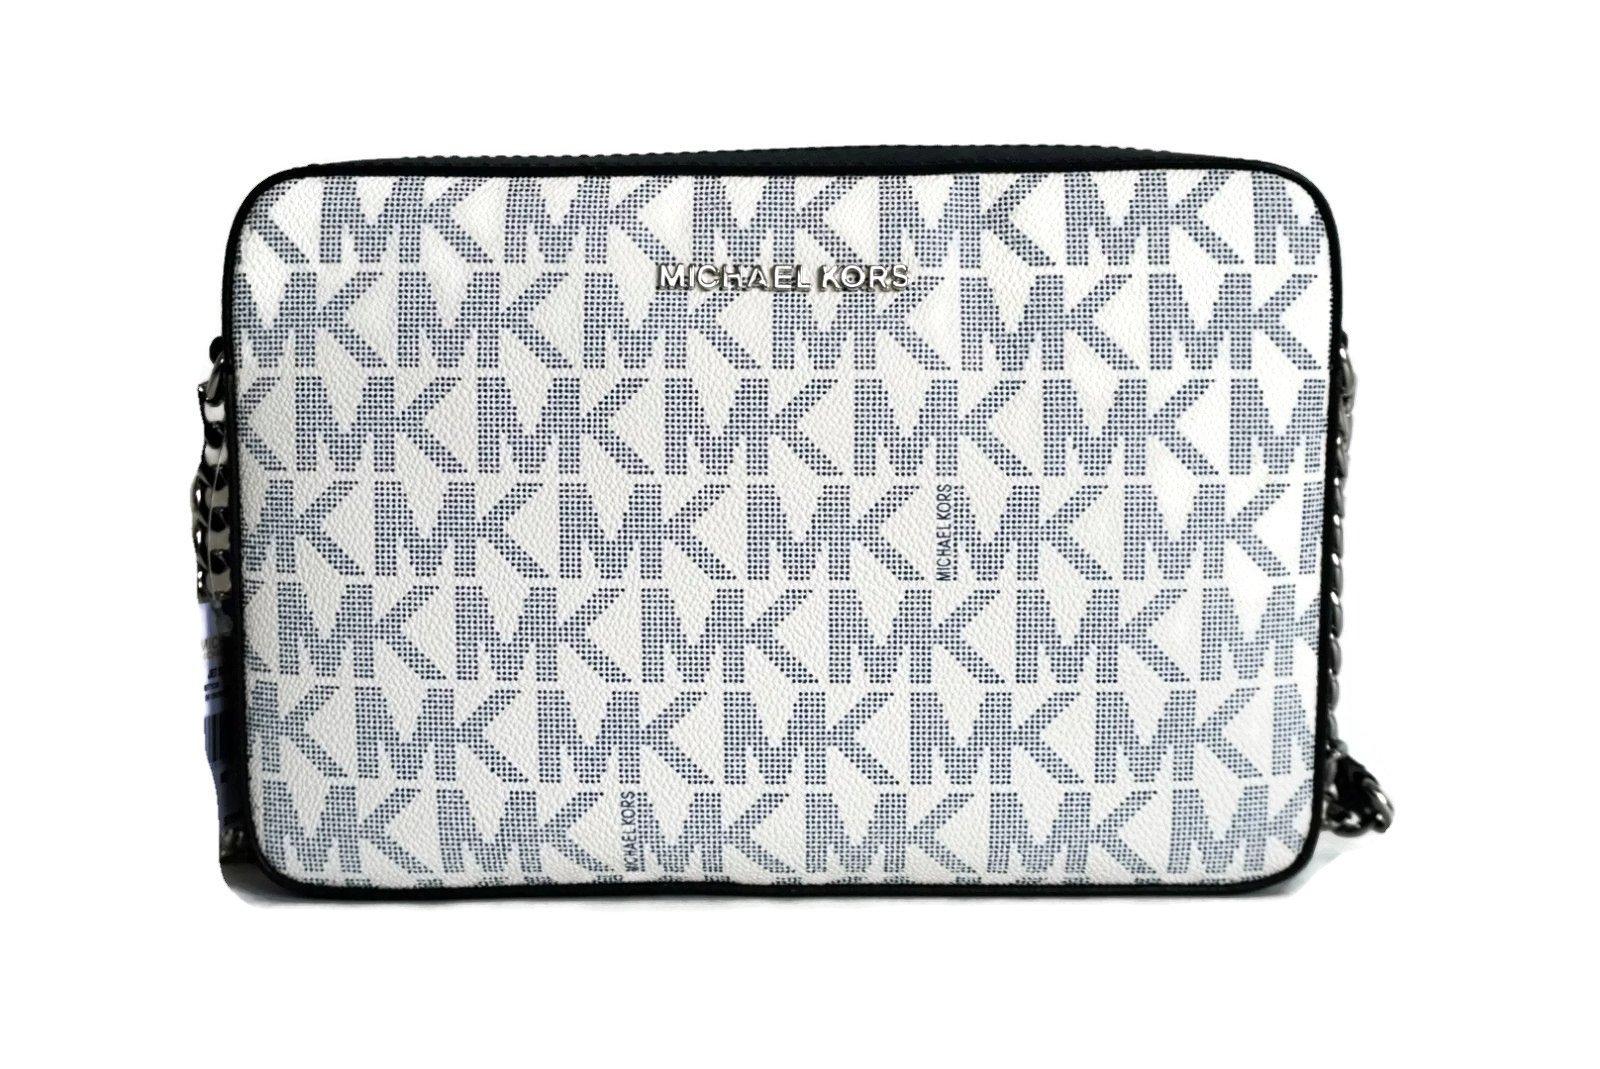 MICHAEL Michael Kors Jet Set Large East West Crossbody MK Signature Bag - Navy/White